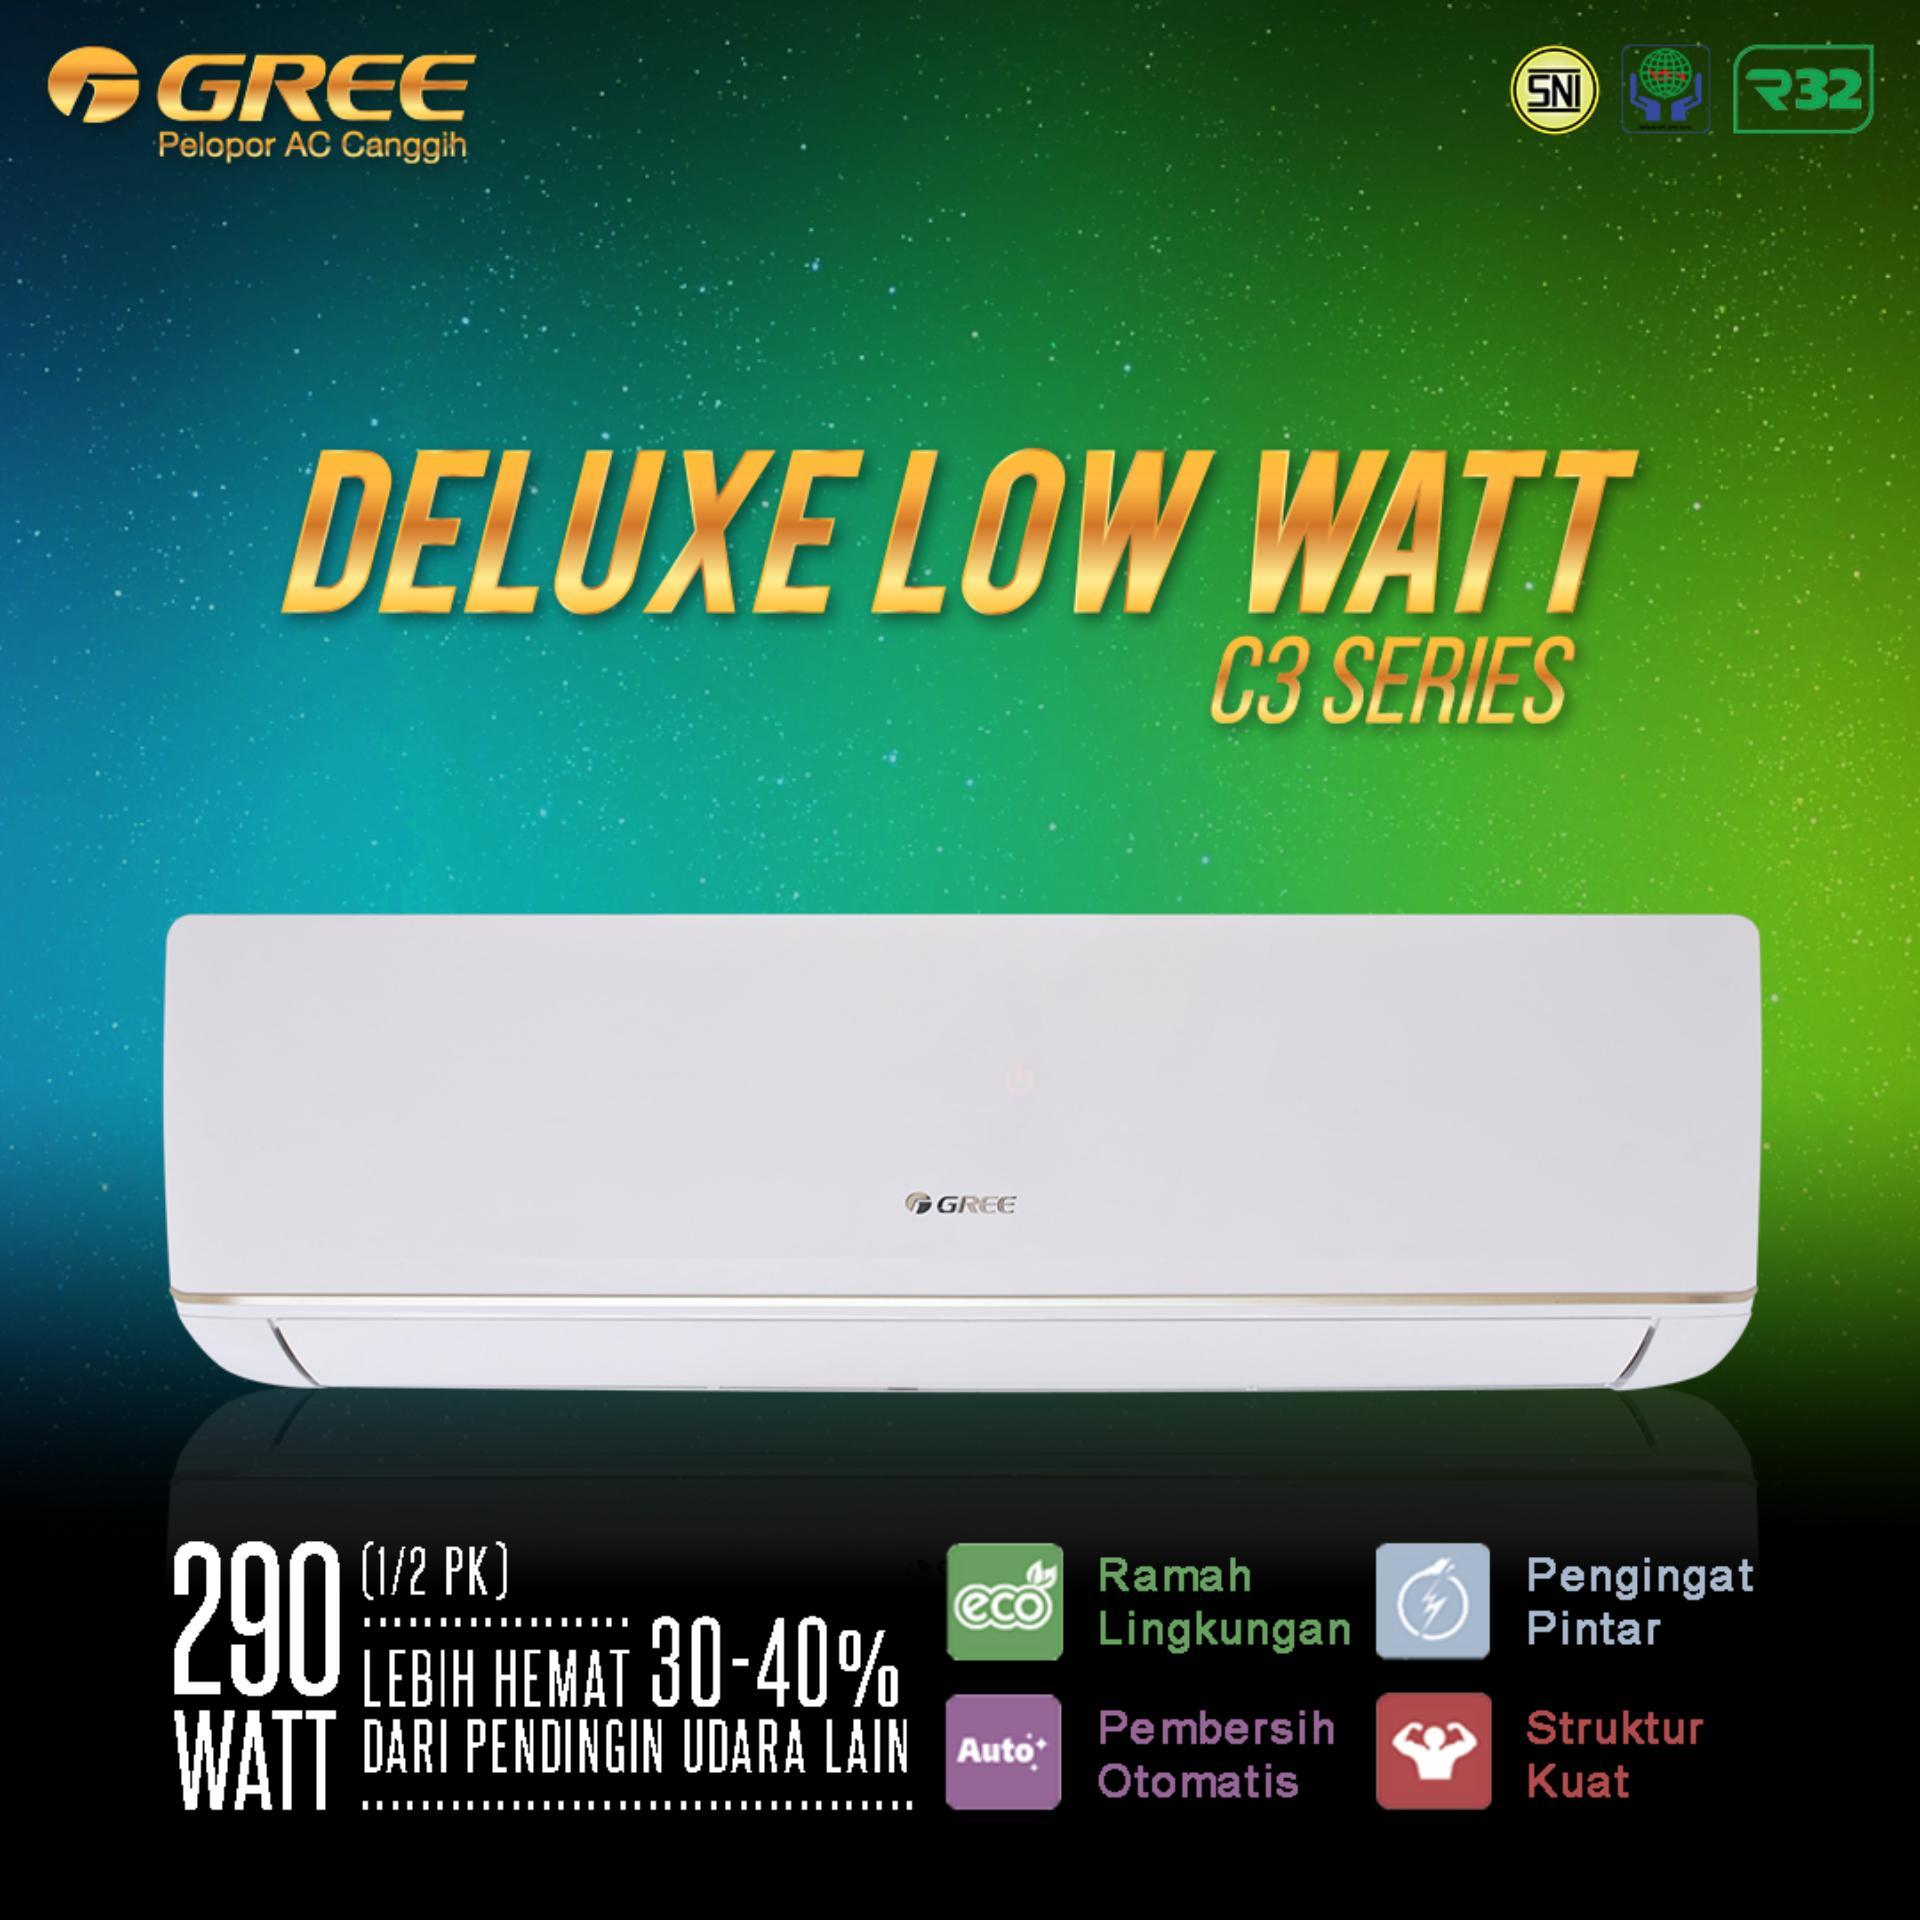 AC GREE 05C3 - Deluxe Low Watt Series (0.5PK) - Unit Only